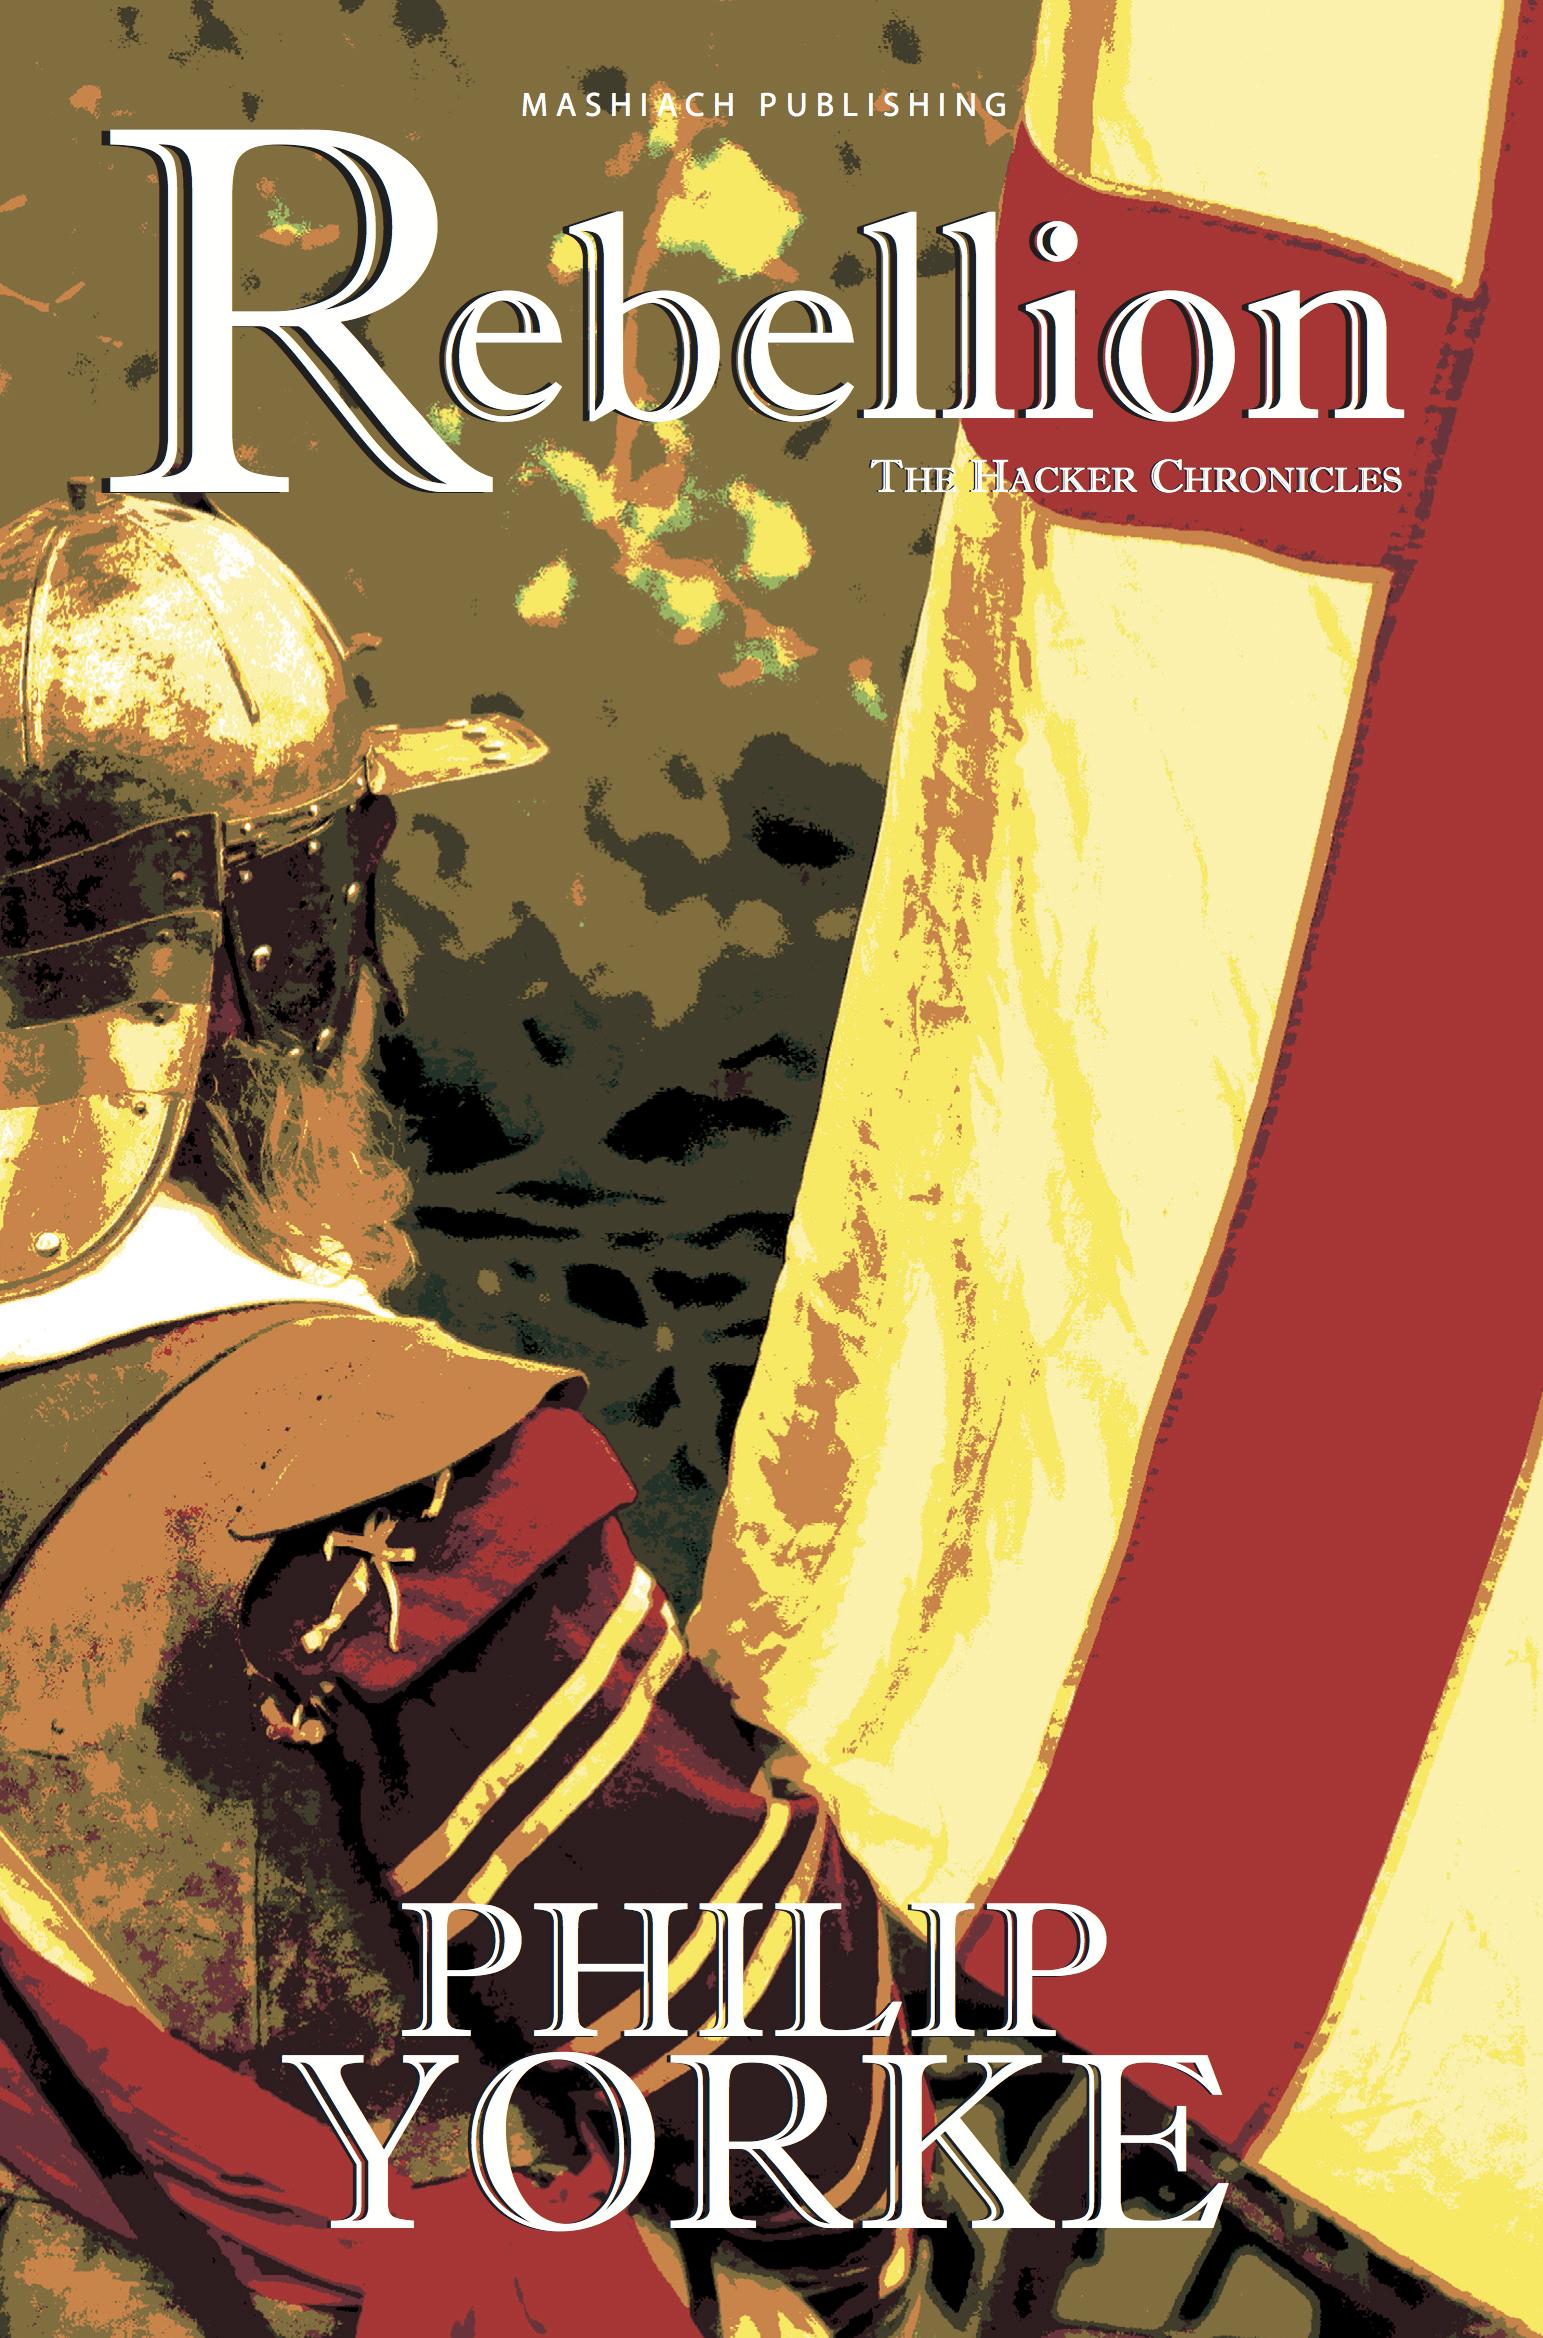 REBELLION COVER New